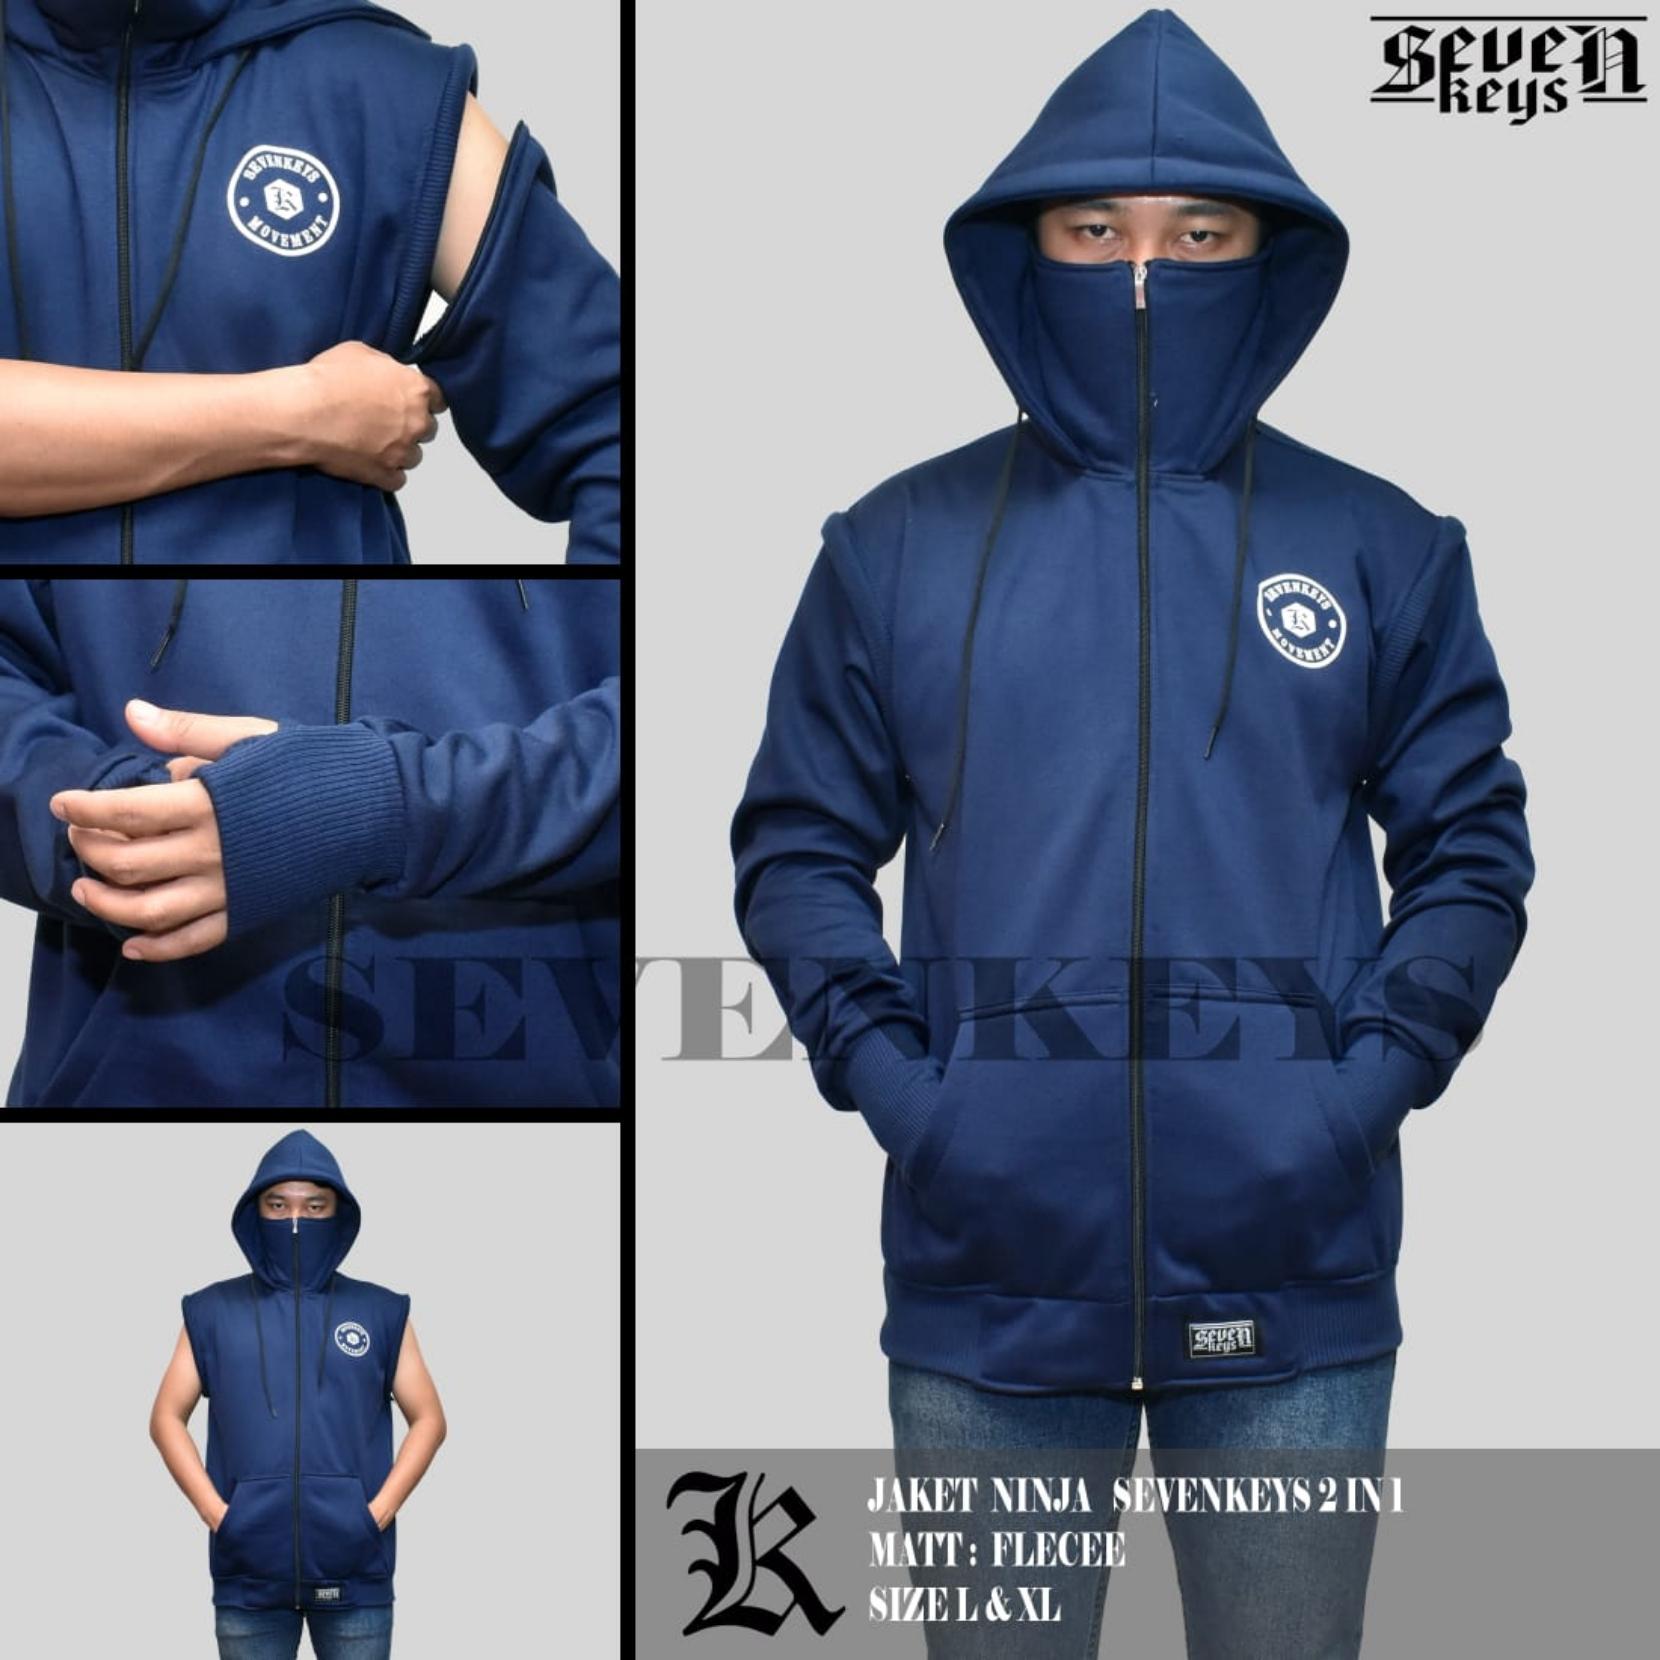 Jaket Hoodie Pria Terbaru Terlengkap Zipper Polos Keren Biru Kz7 Sweater Ninja Seven Keys Sablon 2 In 1